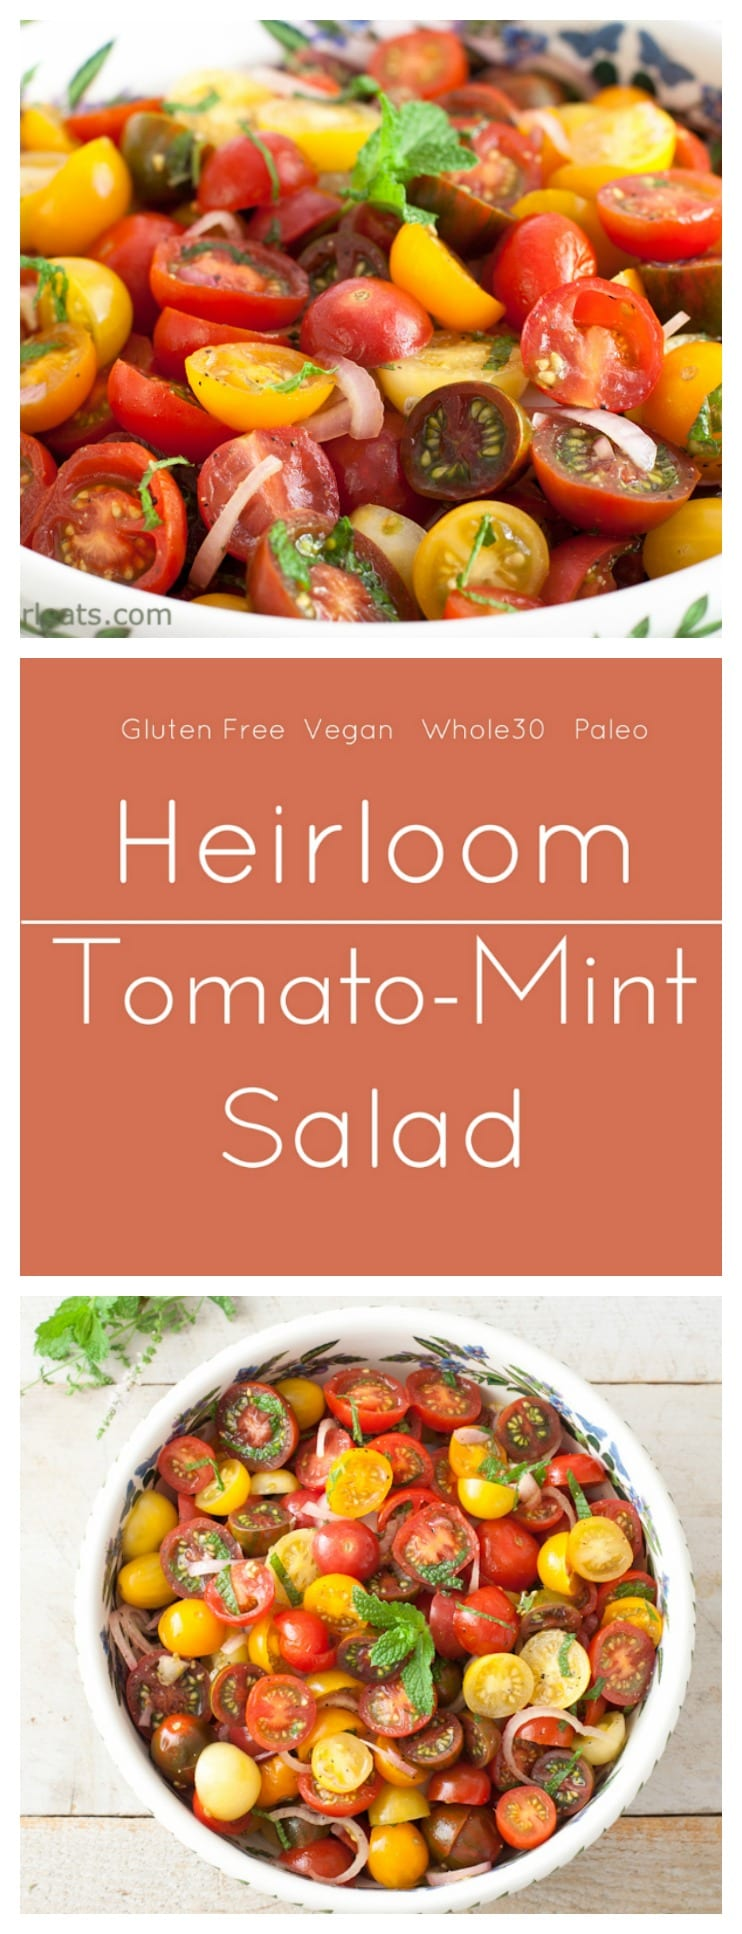 Heirloom Tomato Mint Salad.Whole30 compliant, gluten free and paleo.